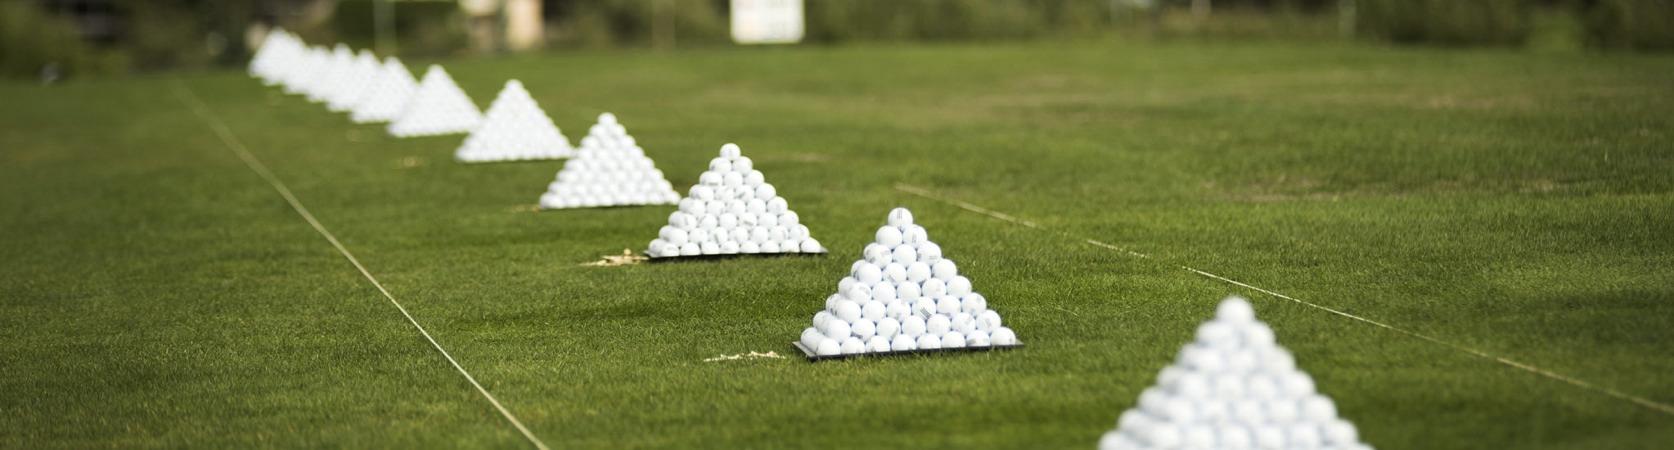 Driving_range_pyramids